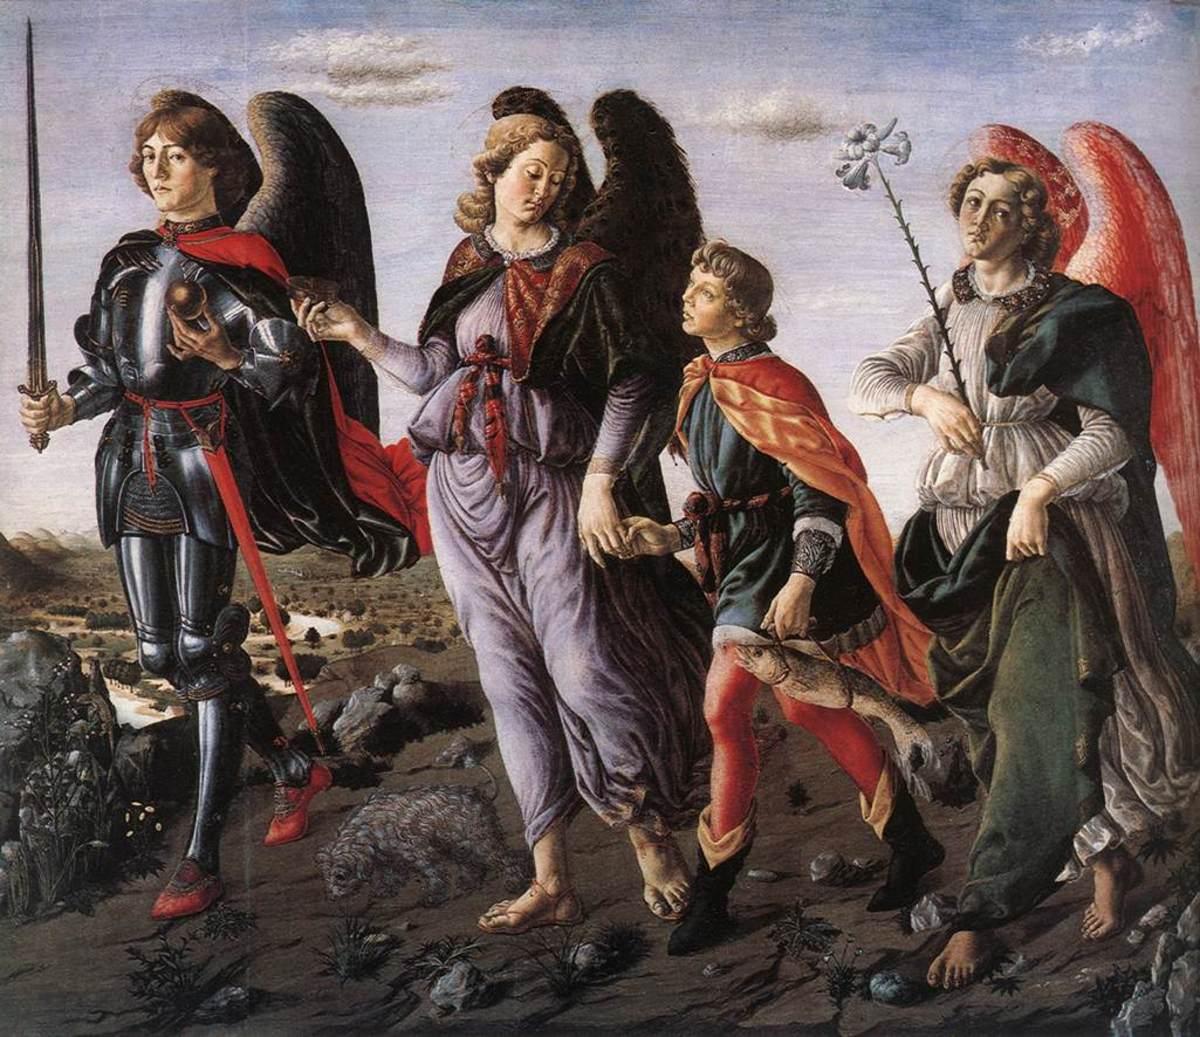 """The Three Archangels with Tobias"" (St. Michael - St. Gabriel - St. Raphael) - by Francesco Botticini (1470)"